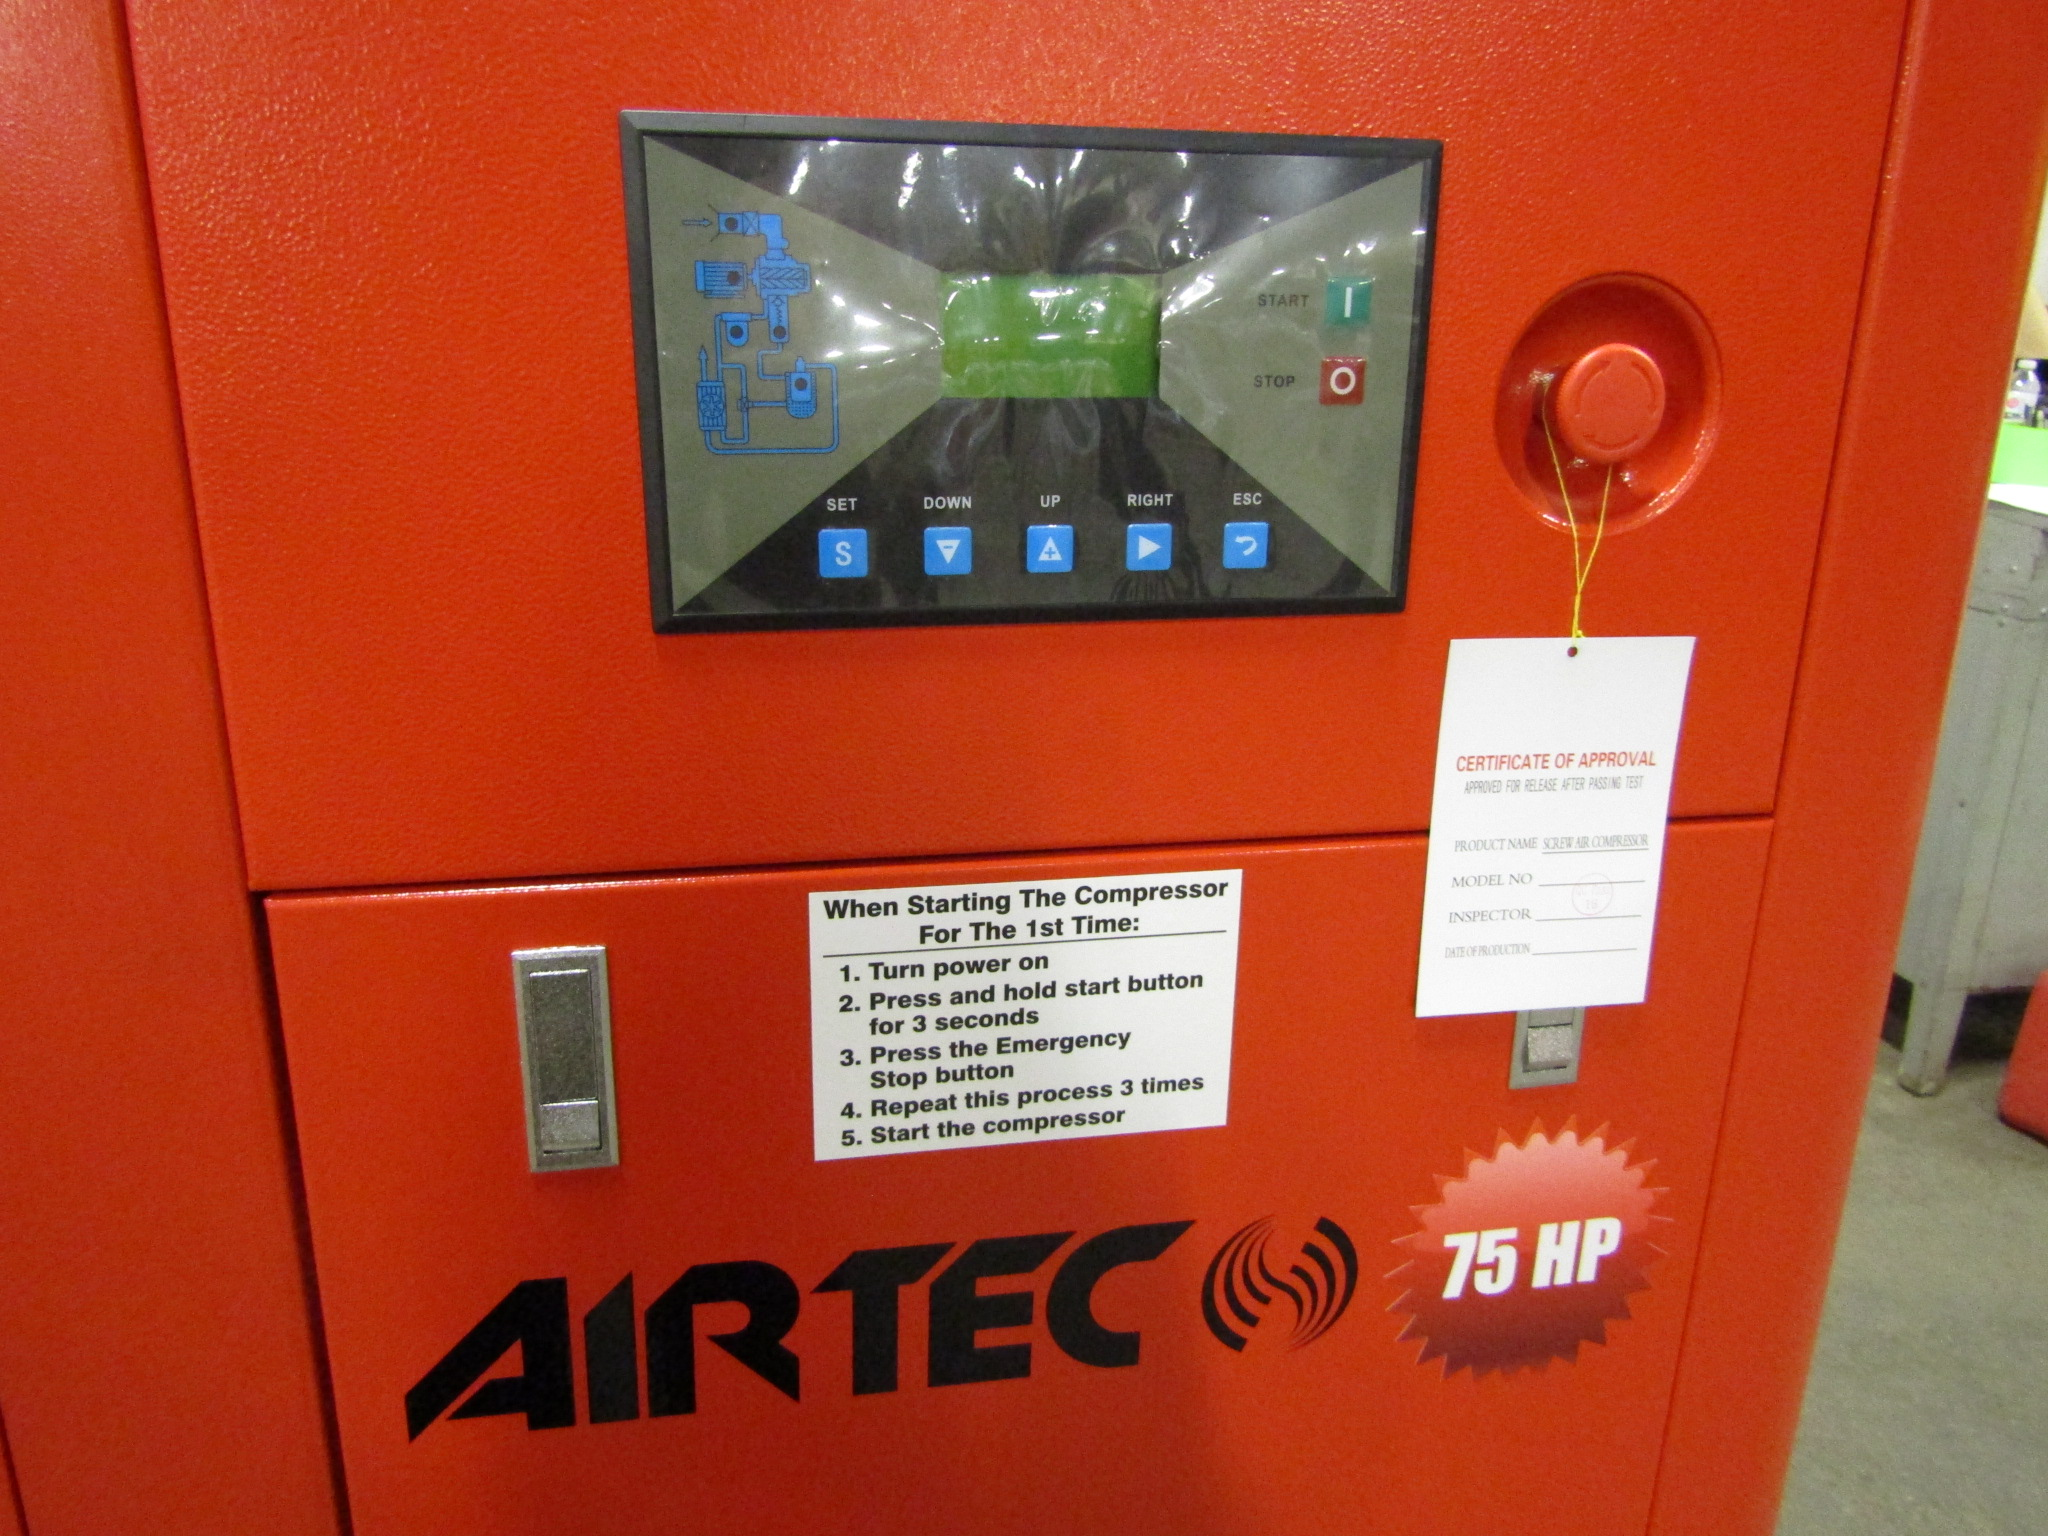 Airtec 75HP Rotary Screw Air Compressor - MINT UNUSED COMPRESSOR - Image 2 of 3